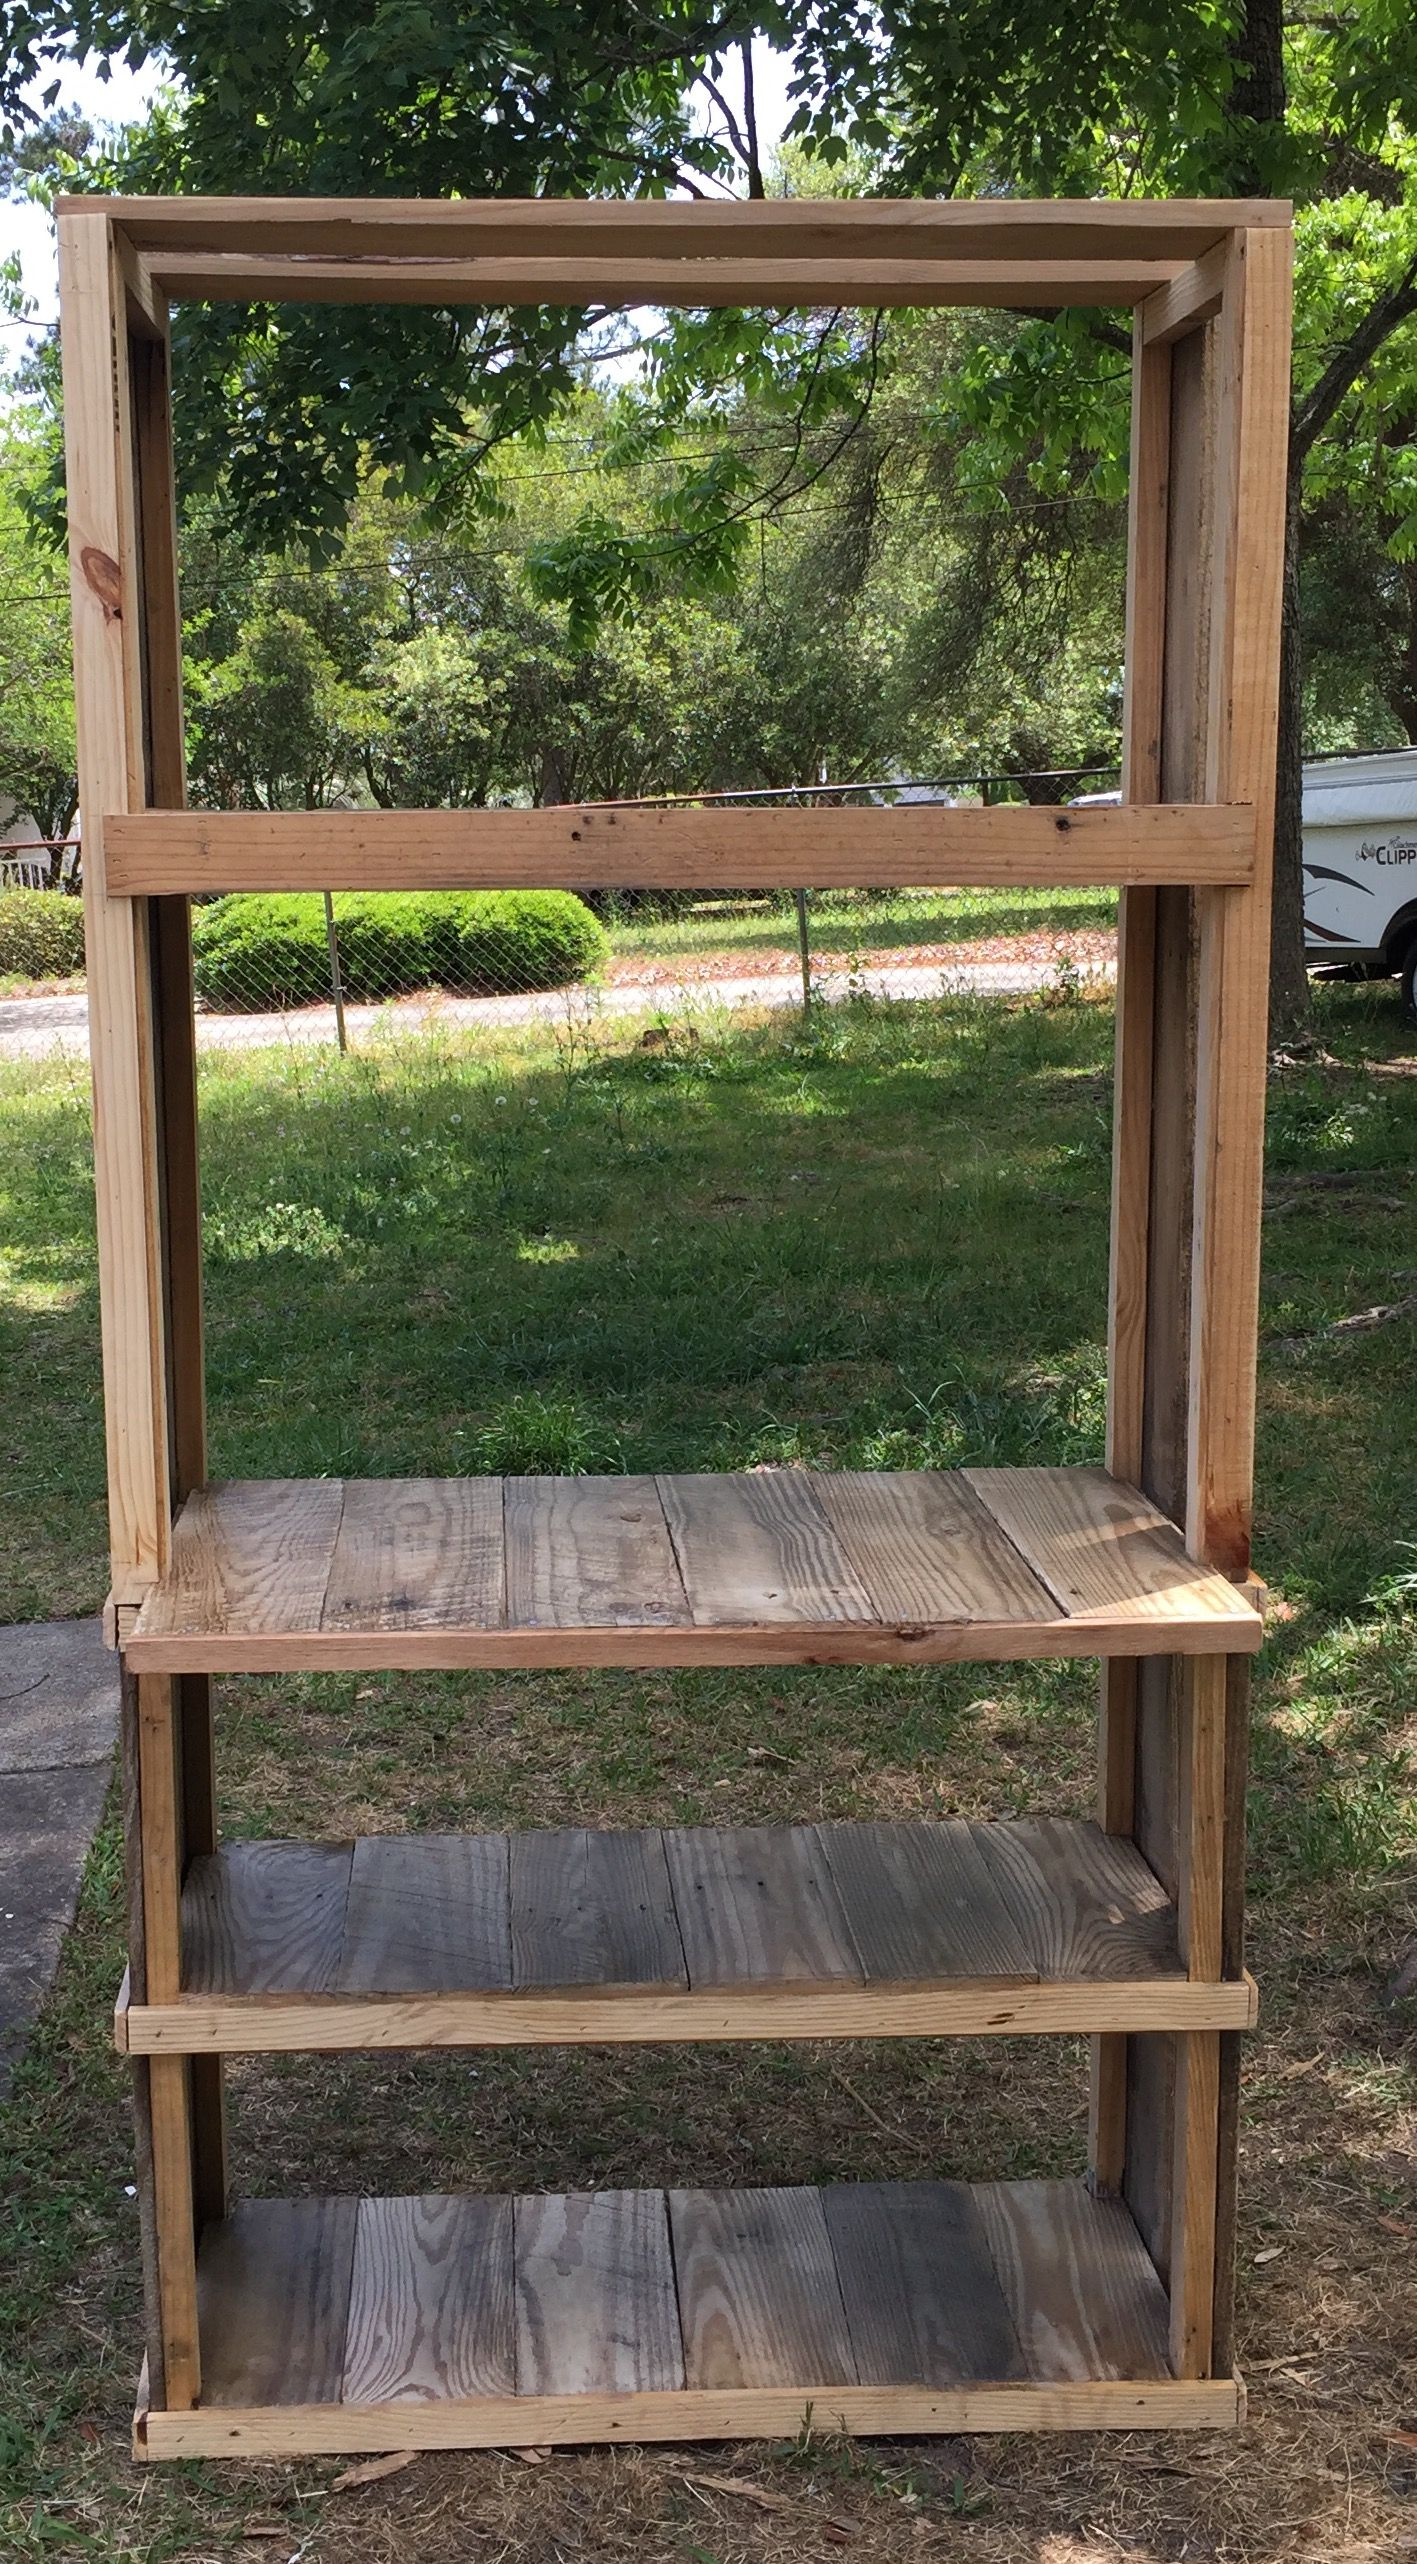 Handmade pallet wood bakers rack made by www